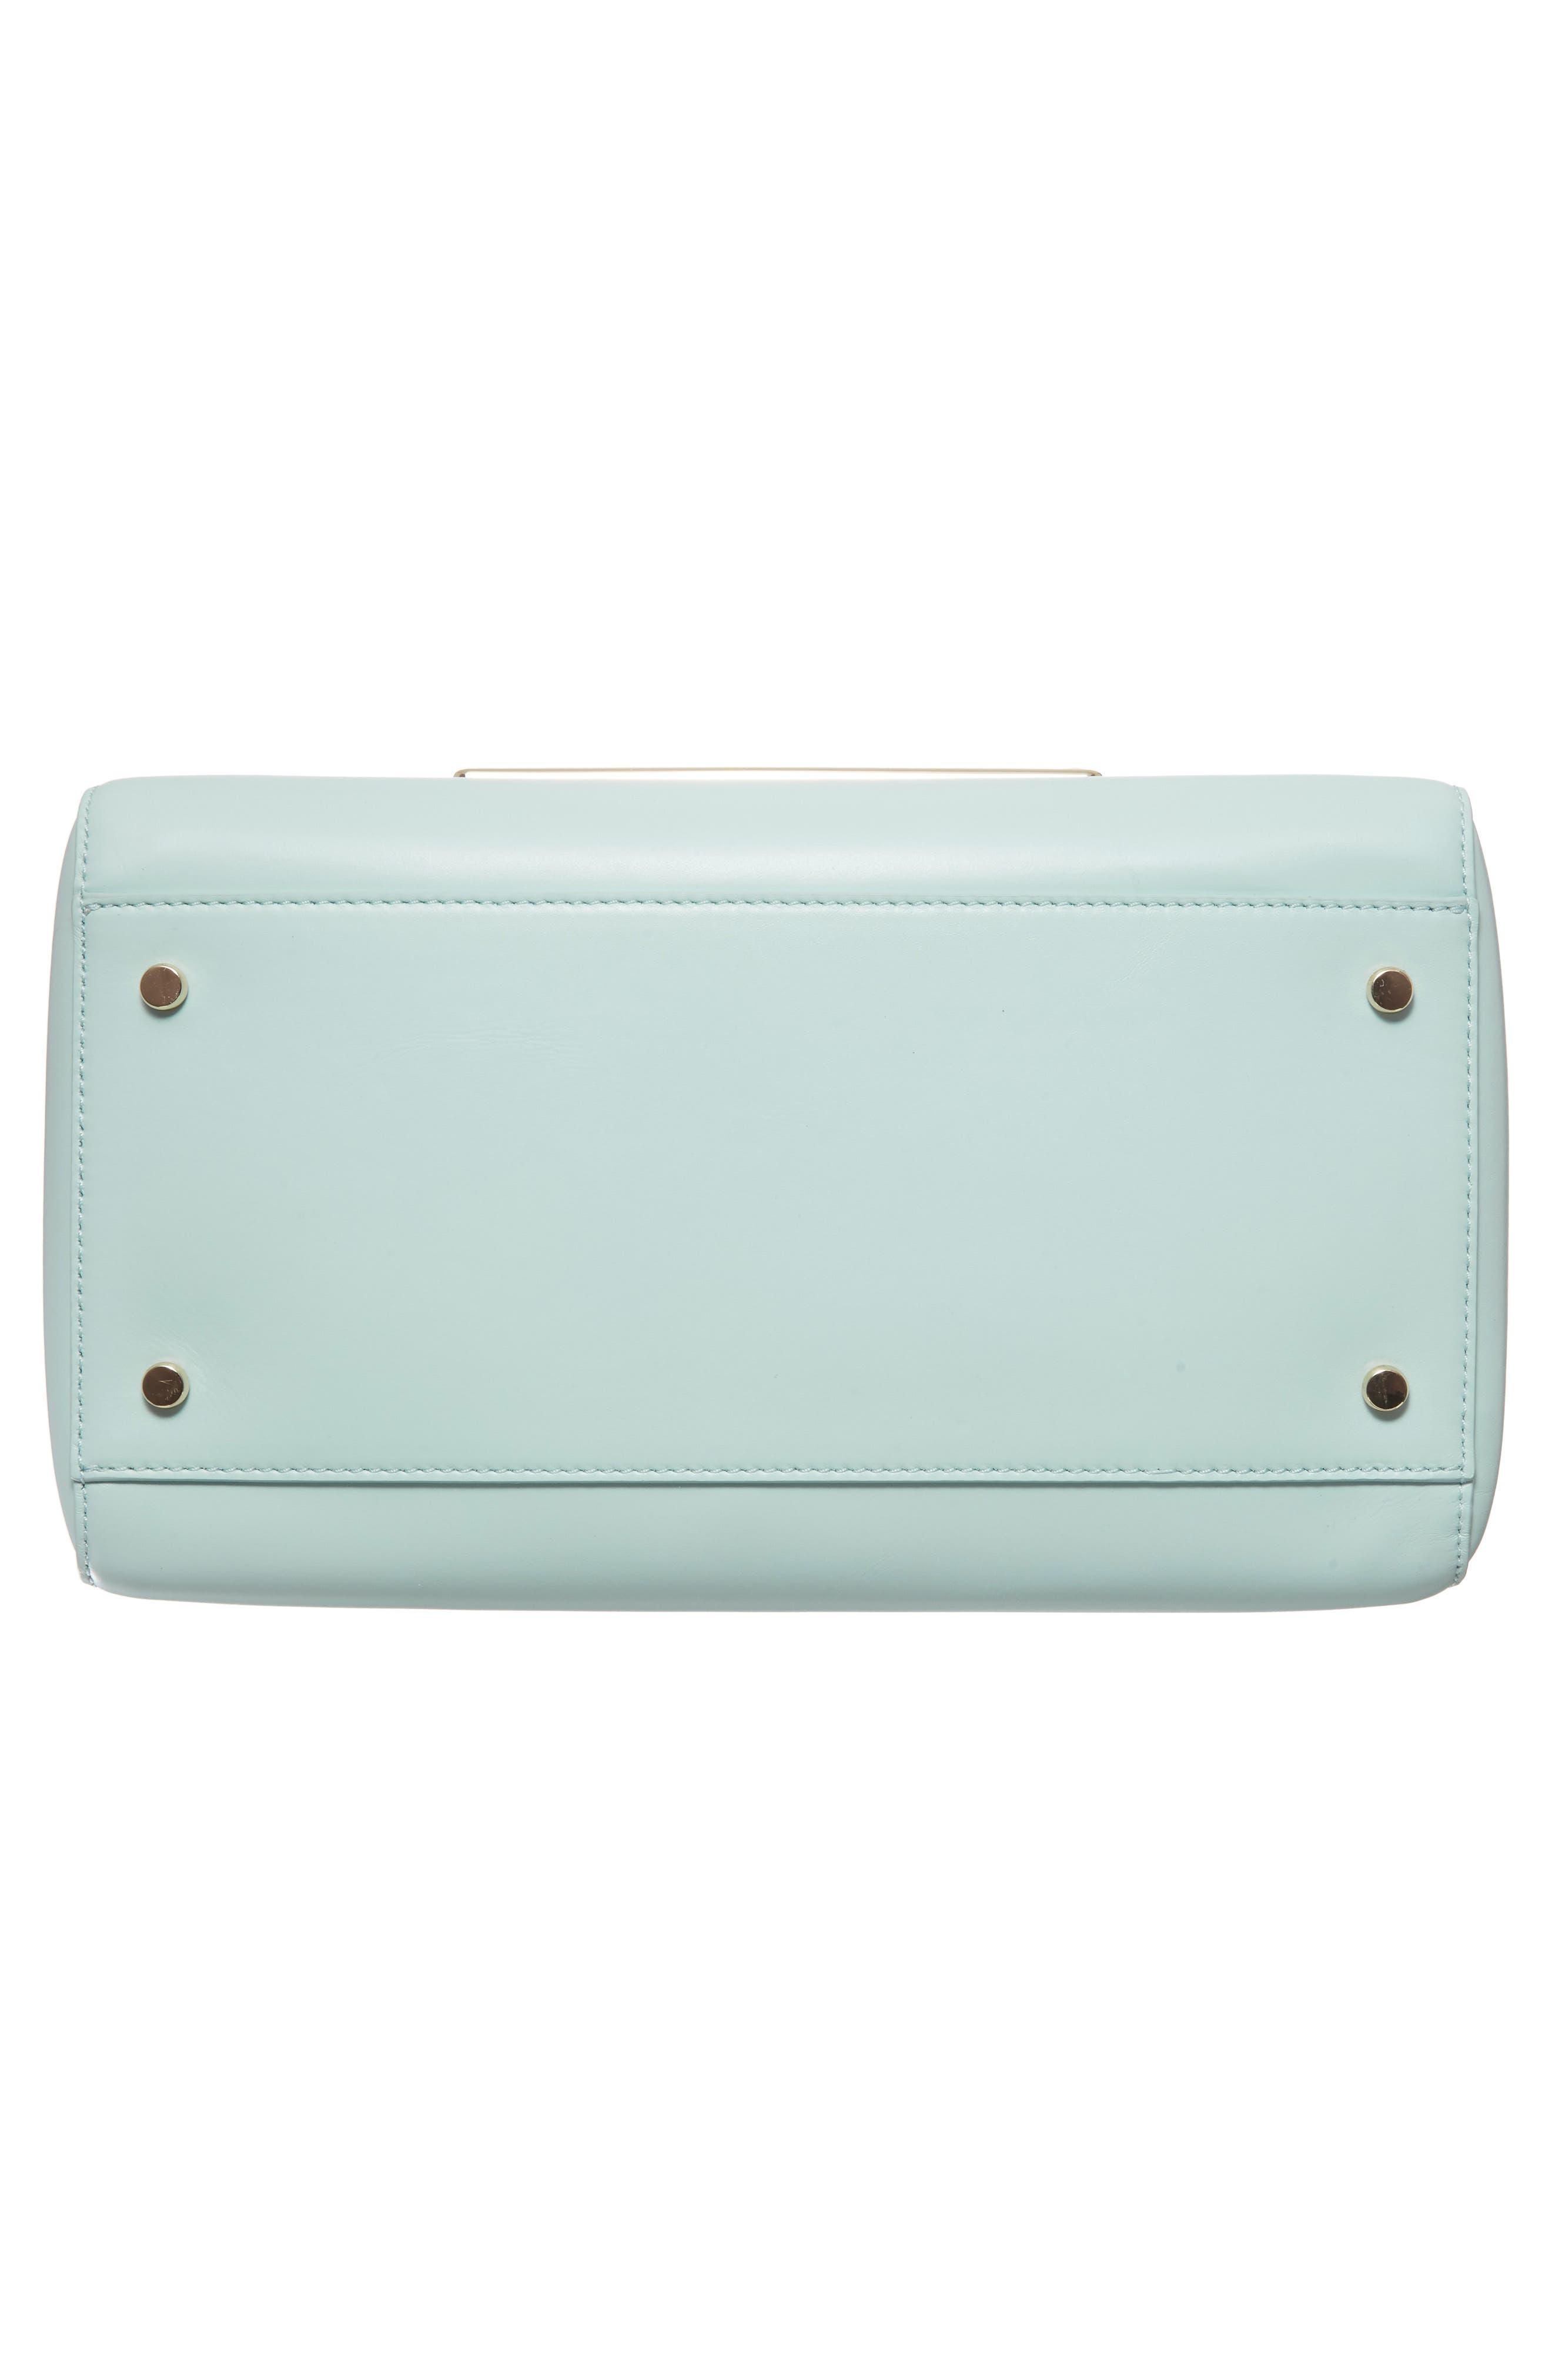 be mine - typewriter leather satchel,                             Alternate thumbnail 7, color,                             474